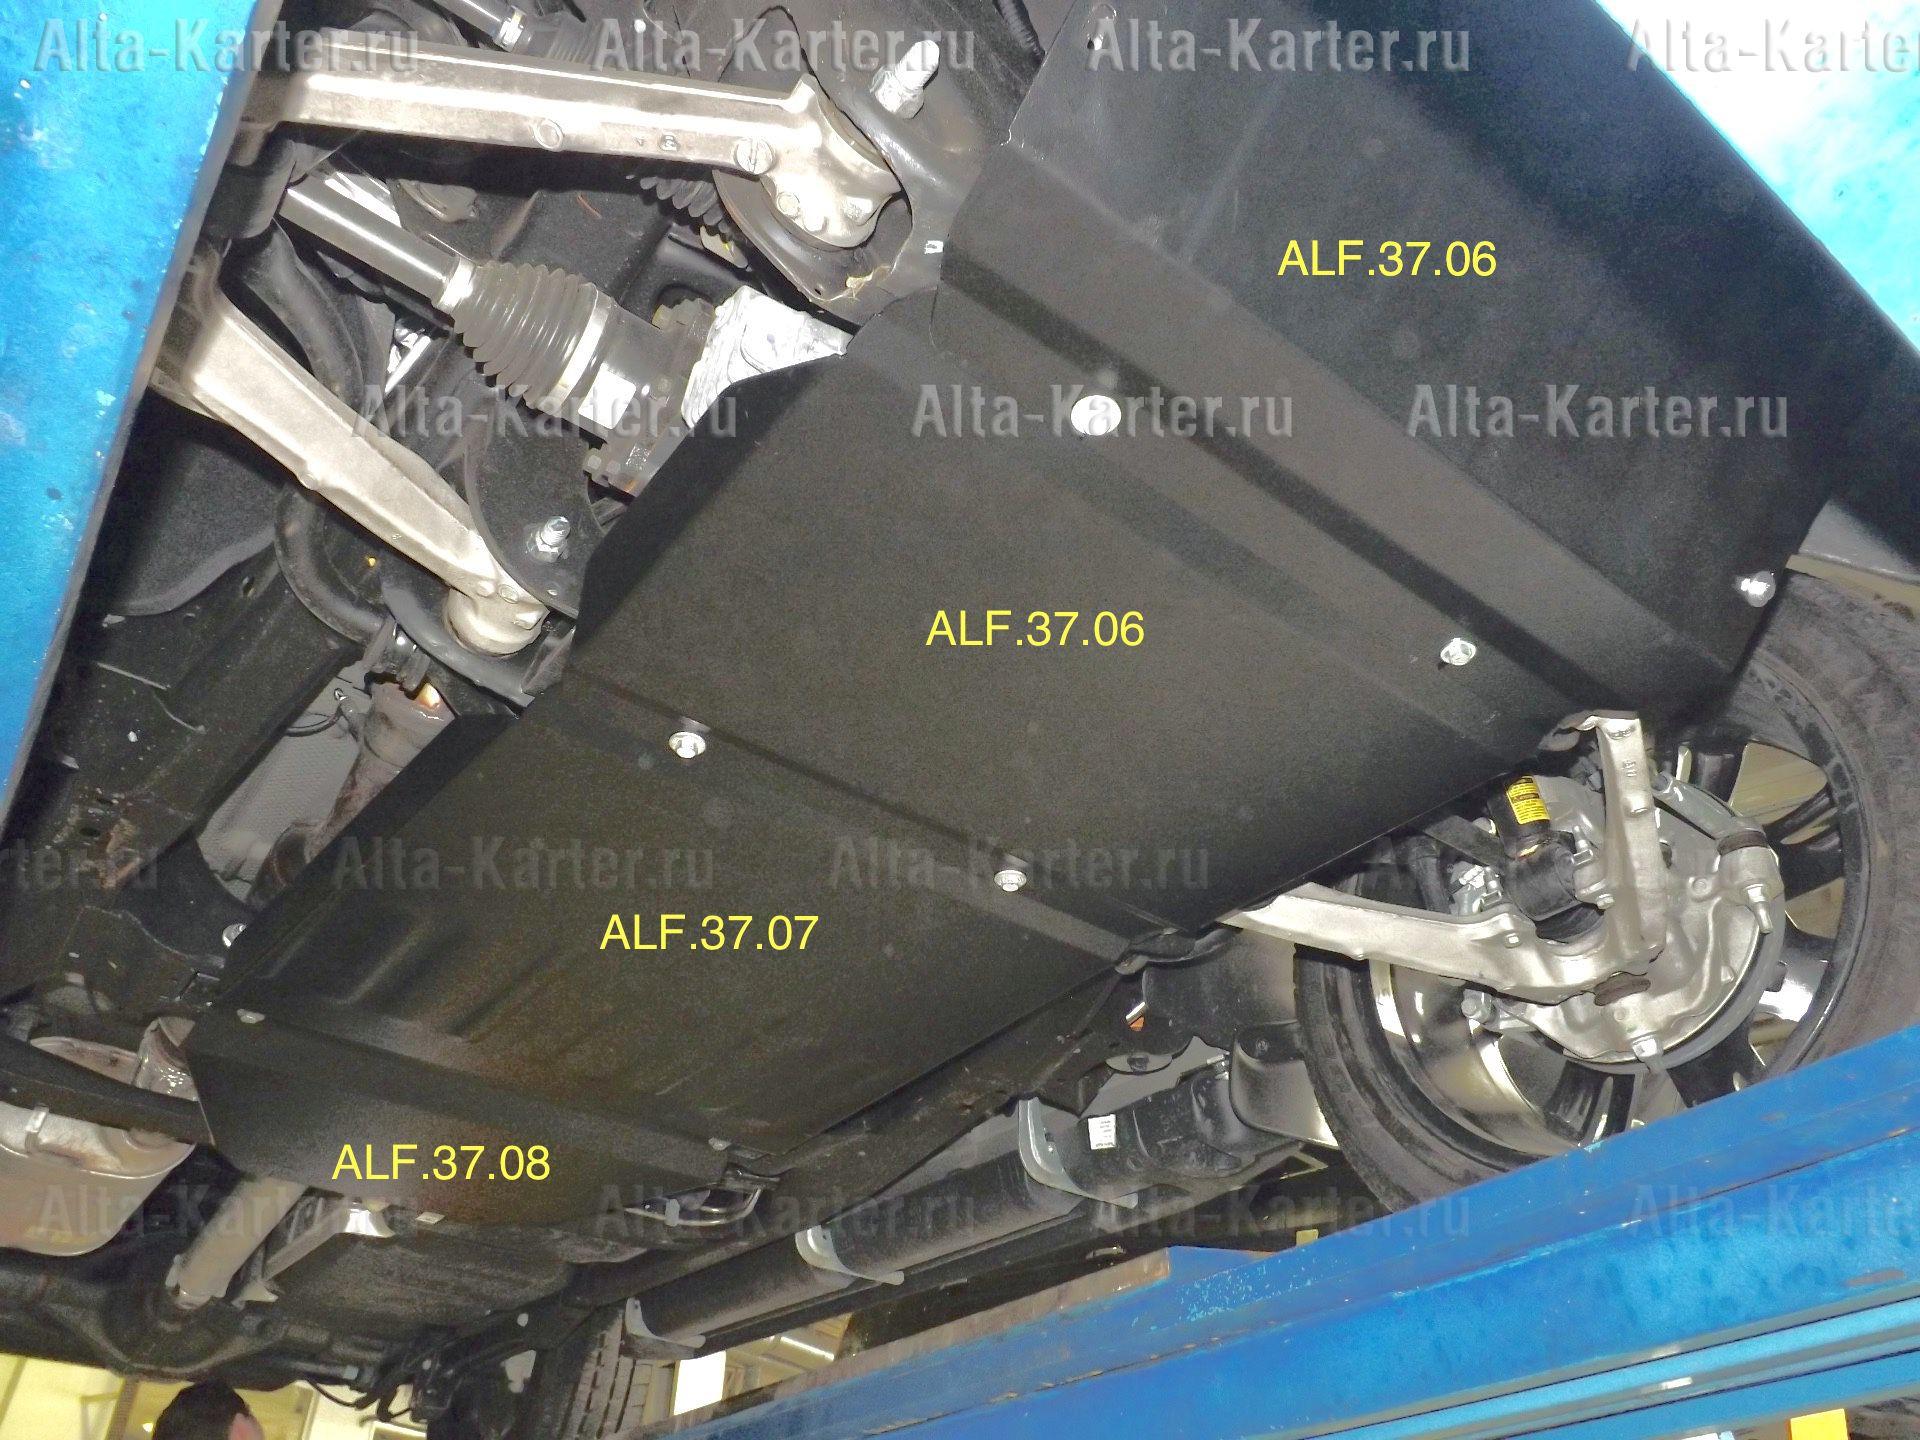 Защита Alfeco для КПП Chevrolet Tahoe IV 2014-2021. Артикул ALF.37.07